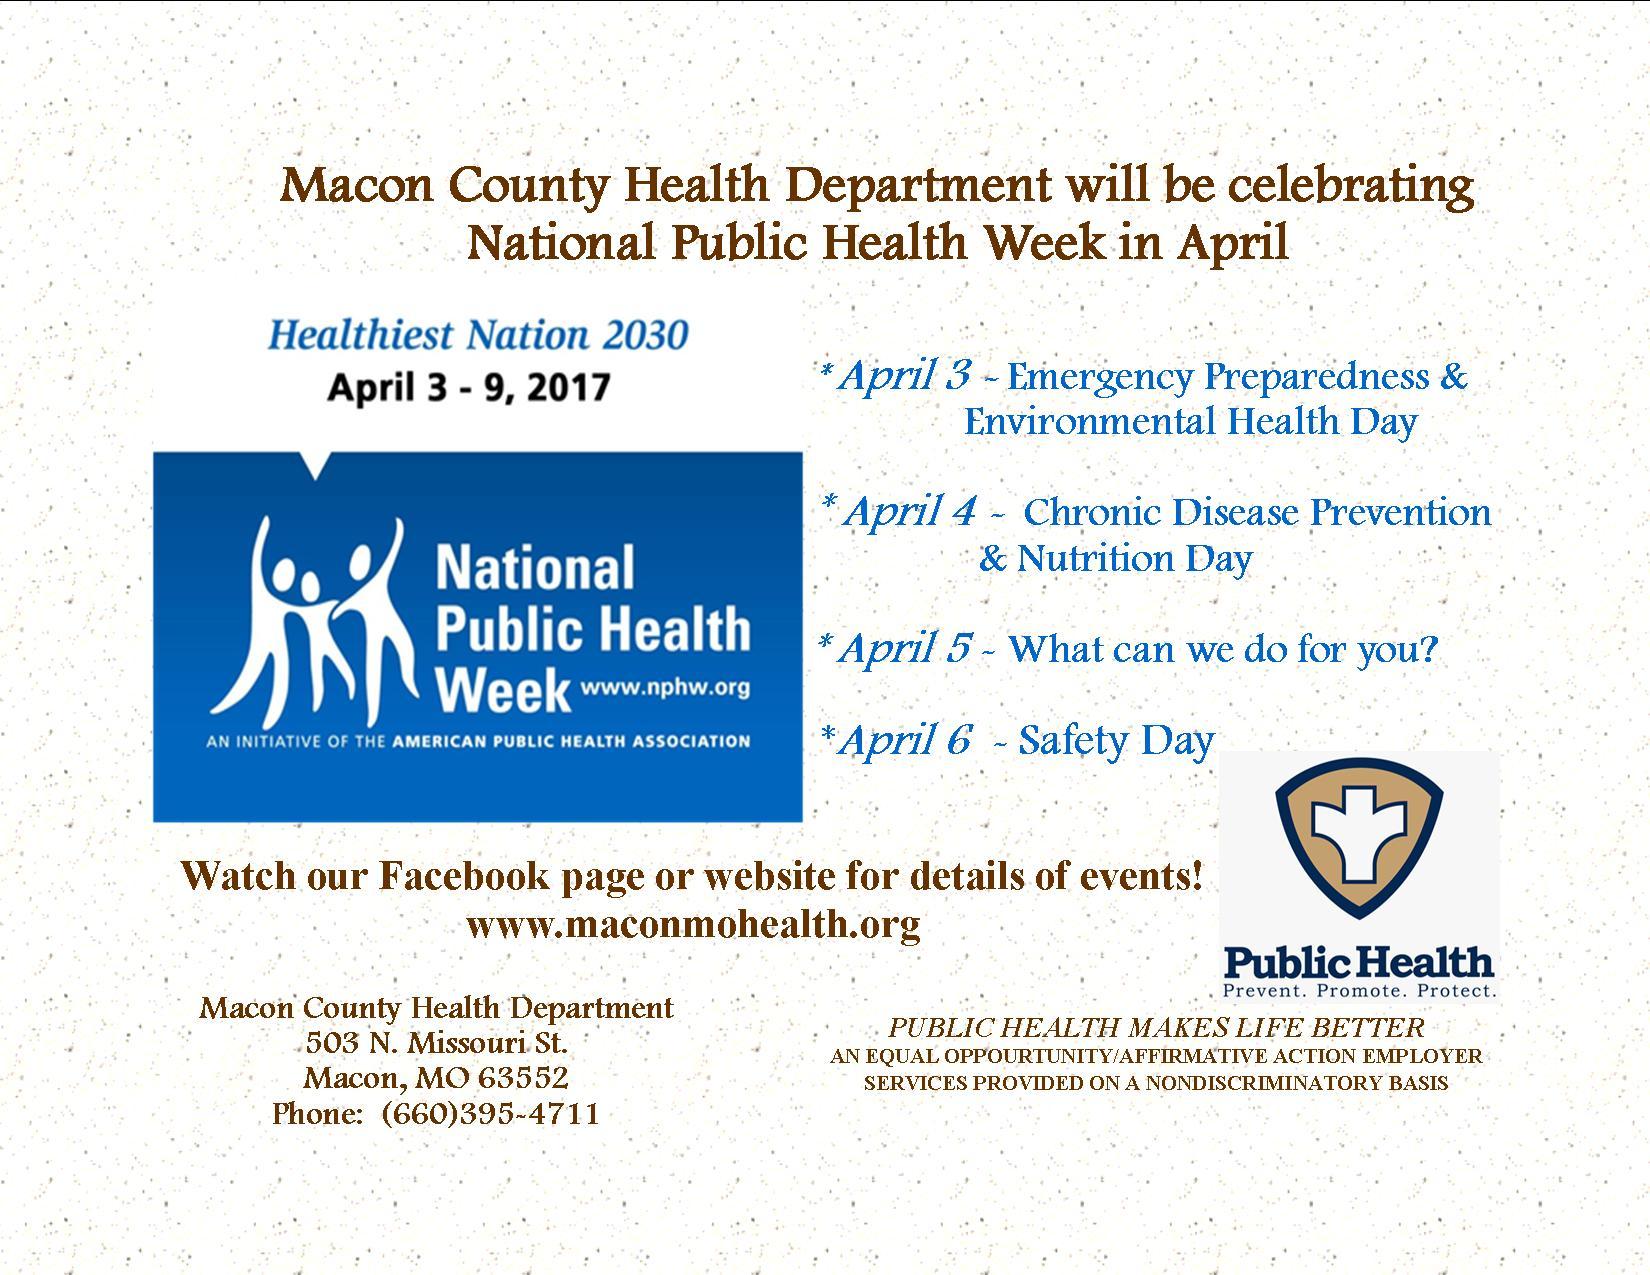 Public health week facebook